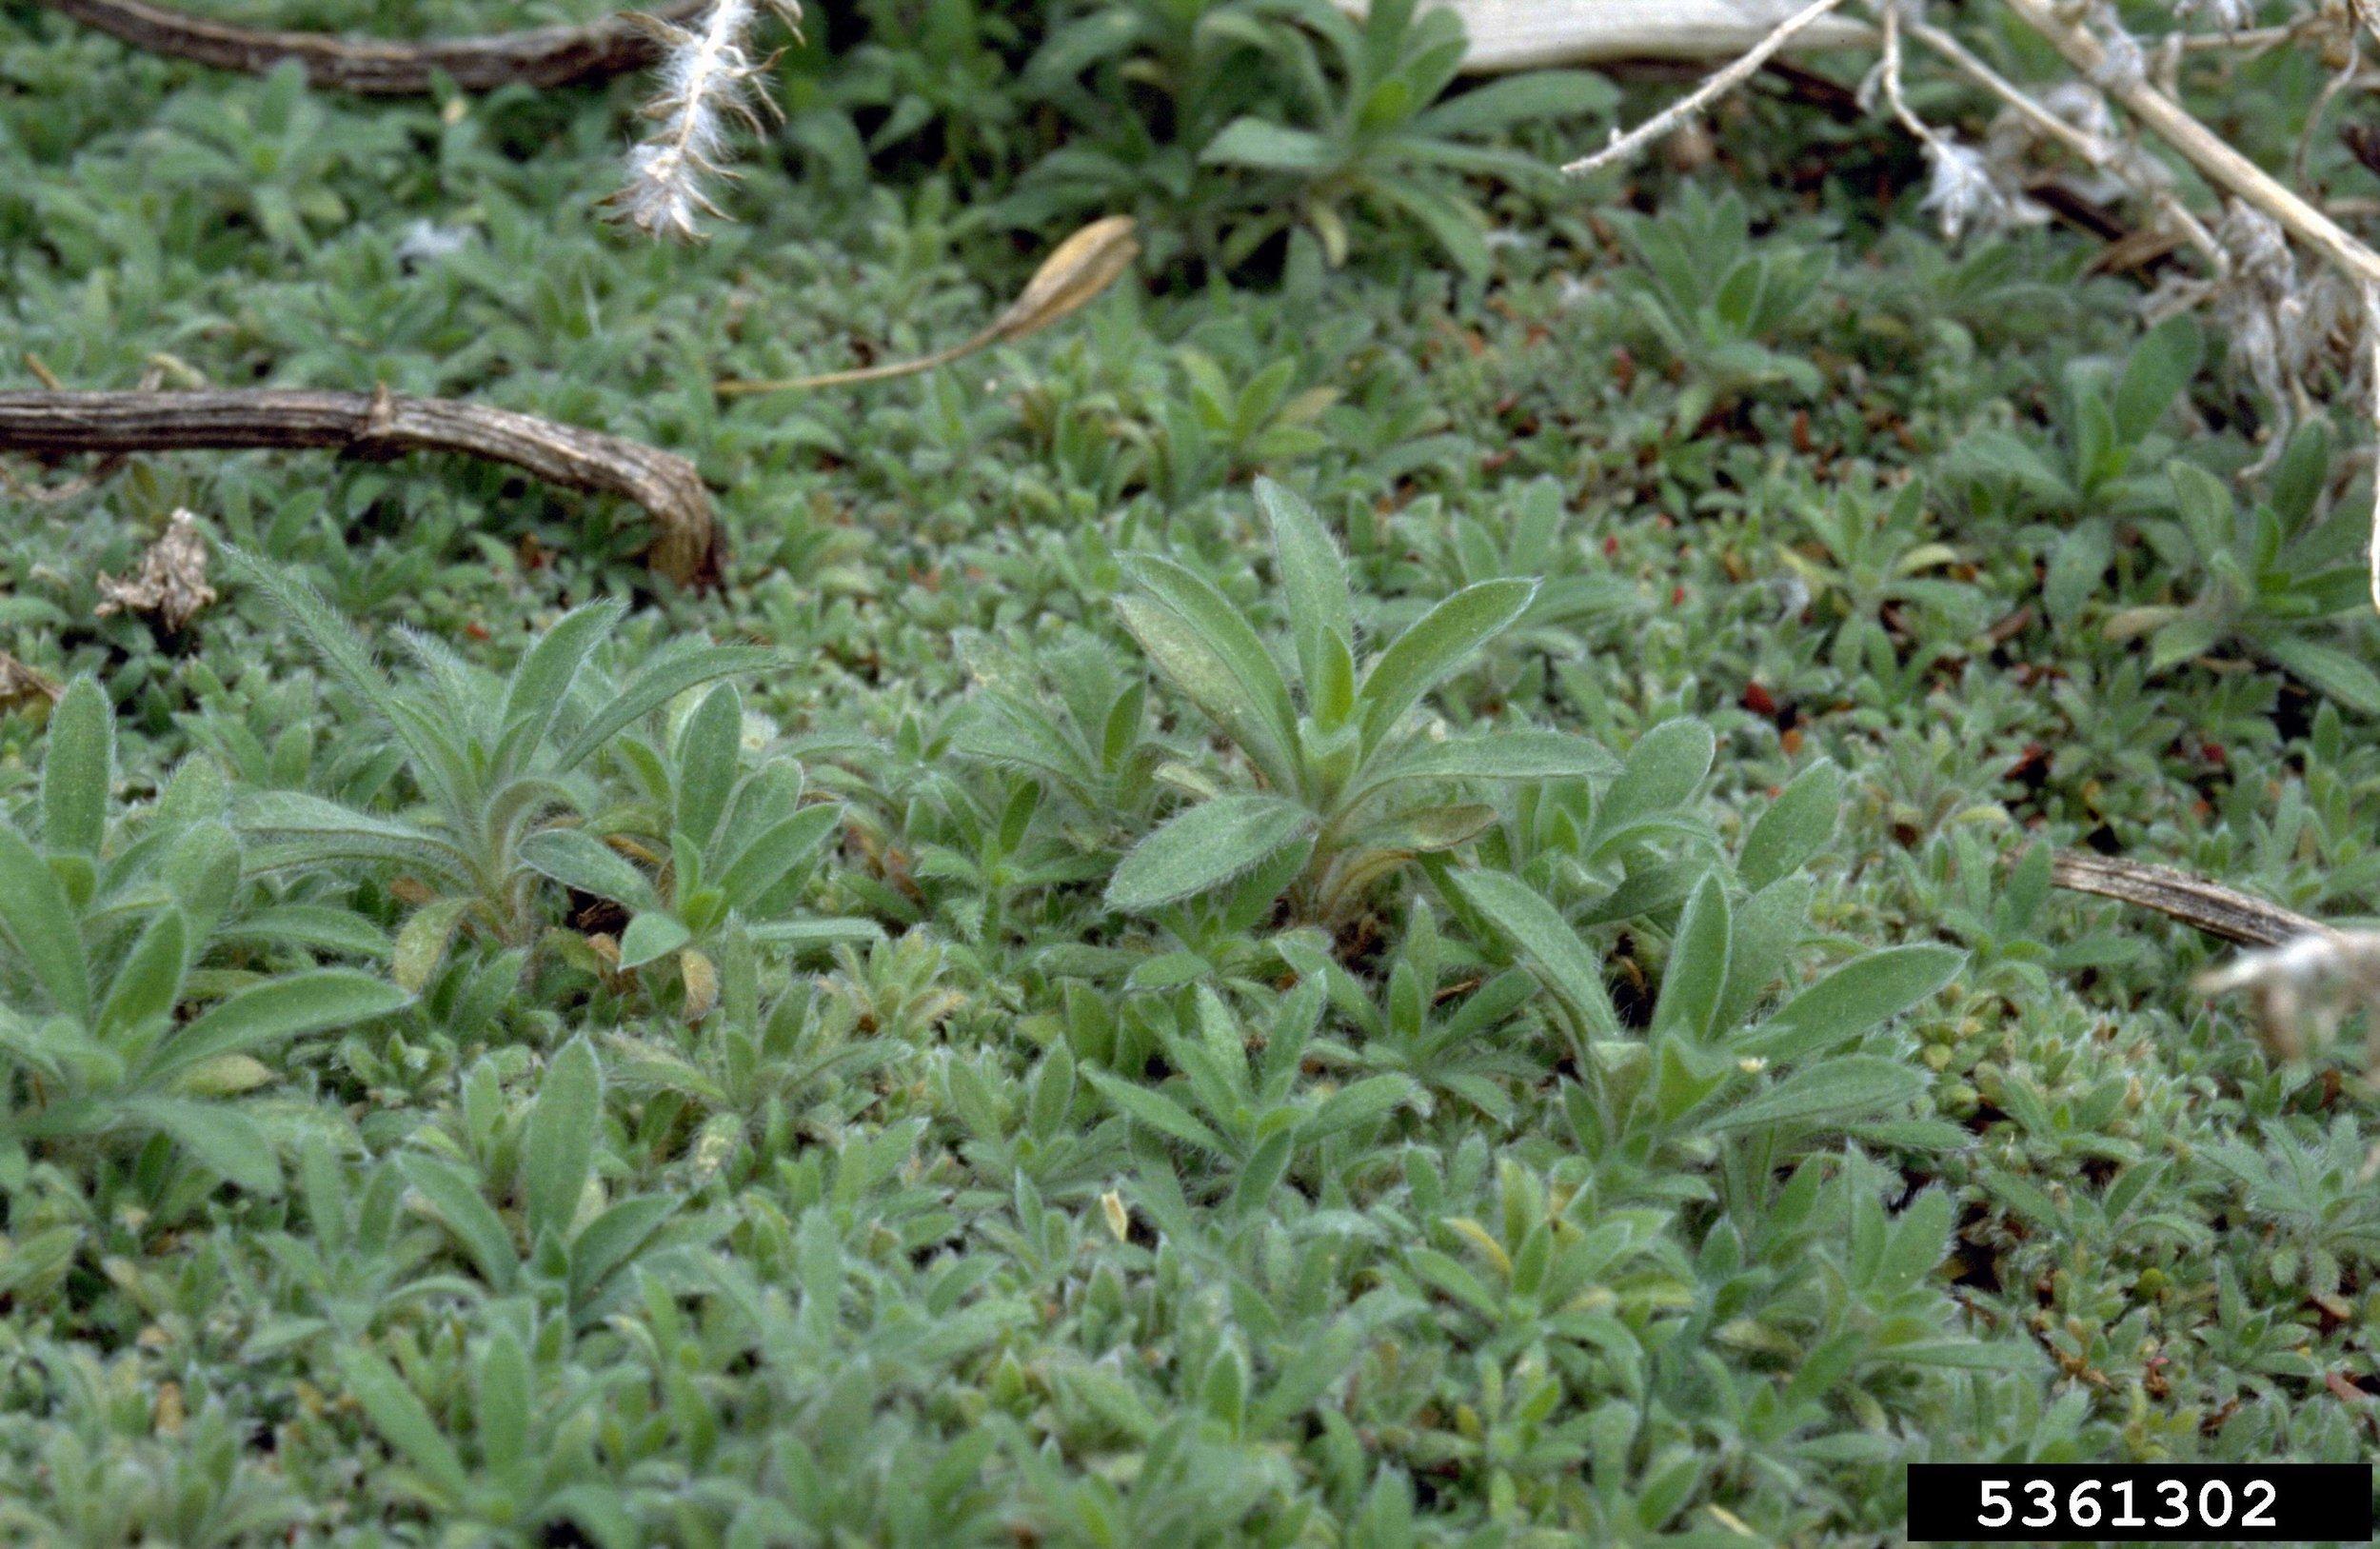 Kochia mat of seedlings